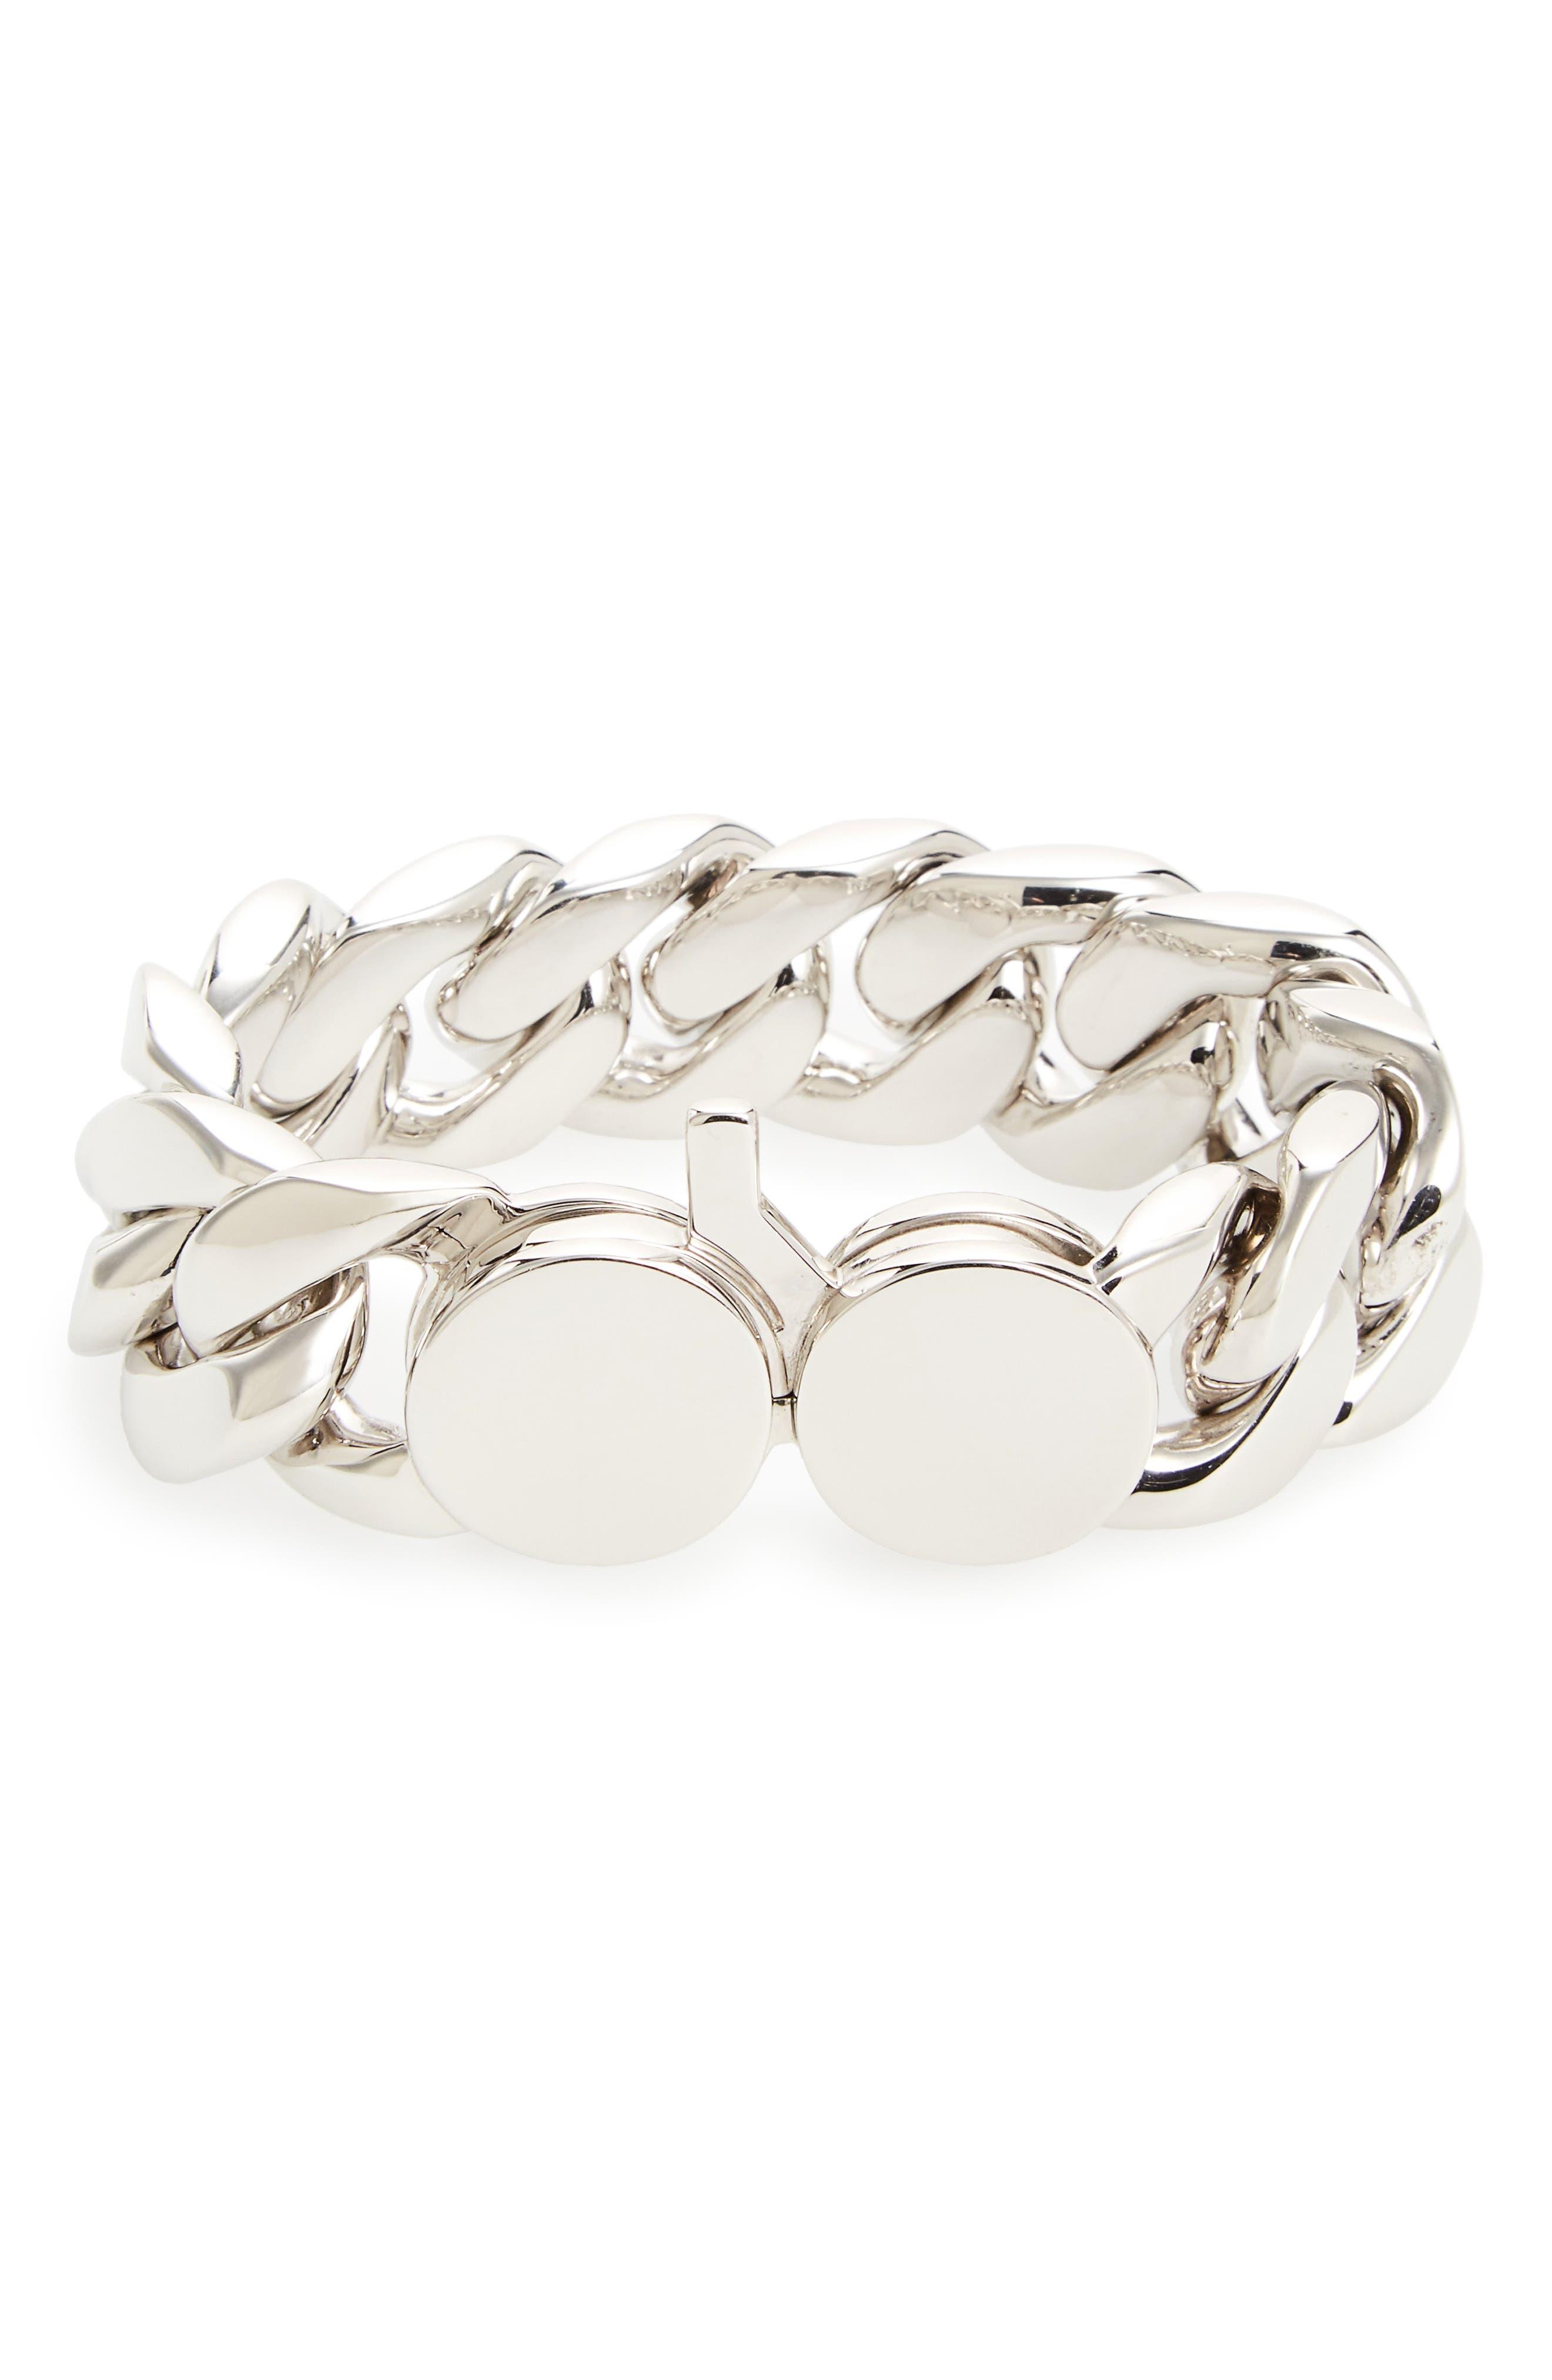 Alternate Image 1 Selected - Tom Wood Medium Chunky Silver Chain Link Bracelet